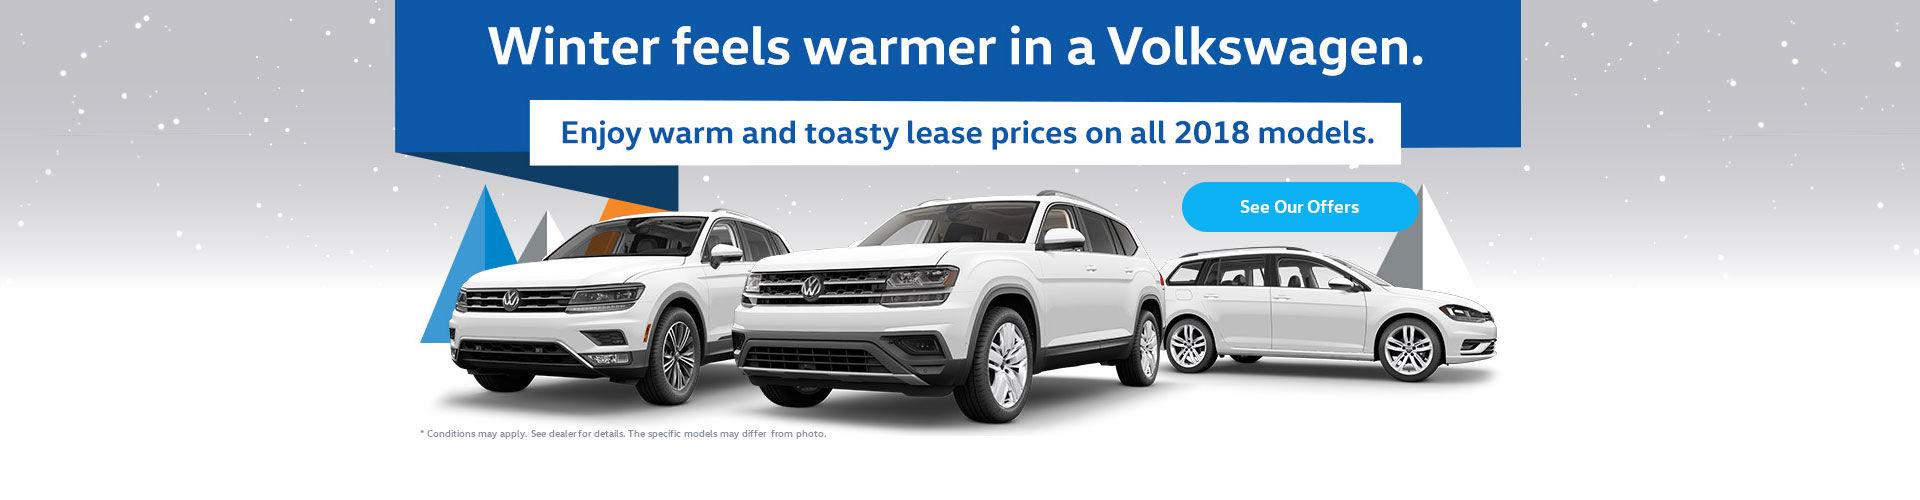 Winter Feels Warmer in a Volkswagen Event